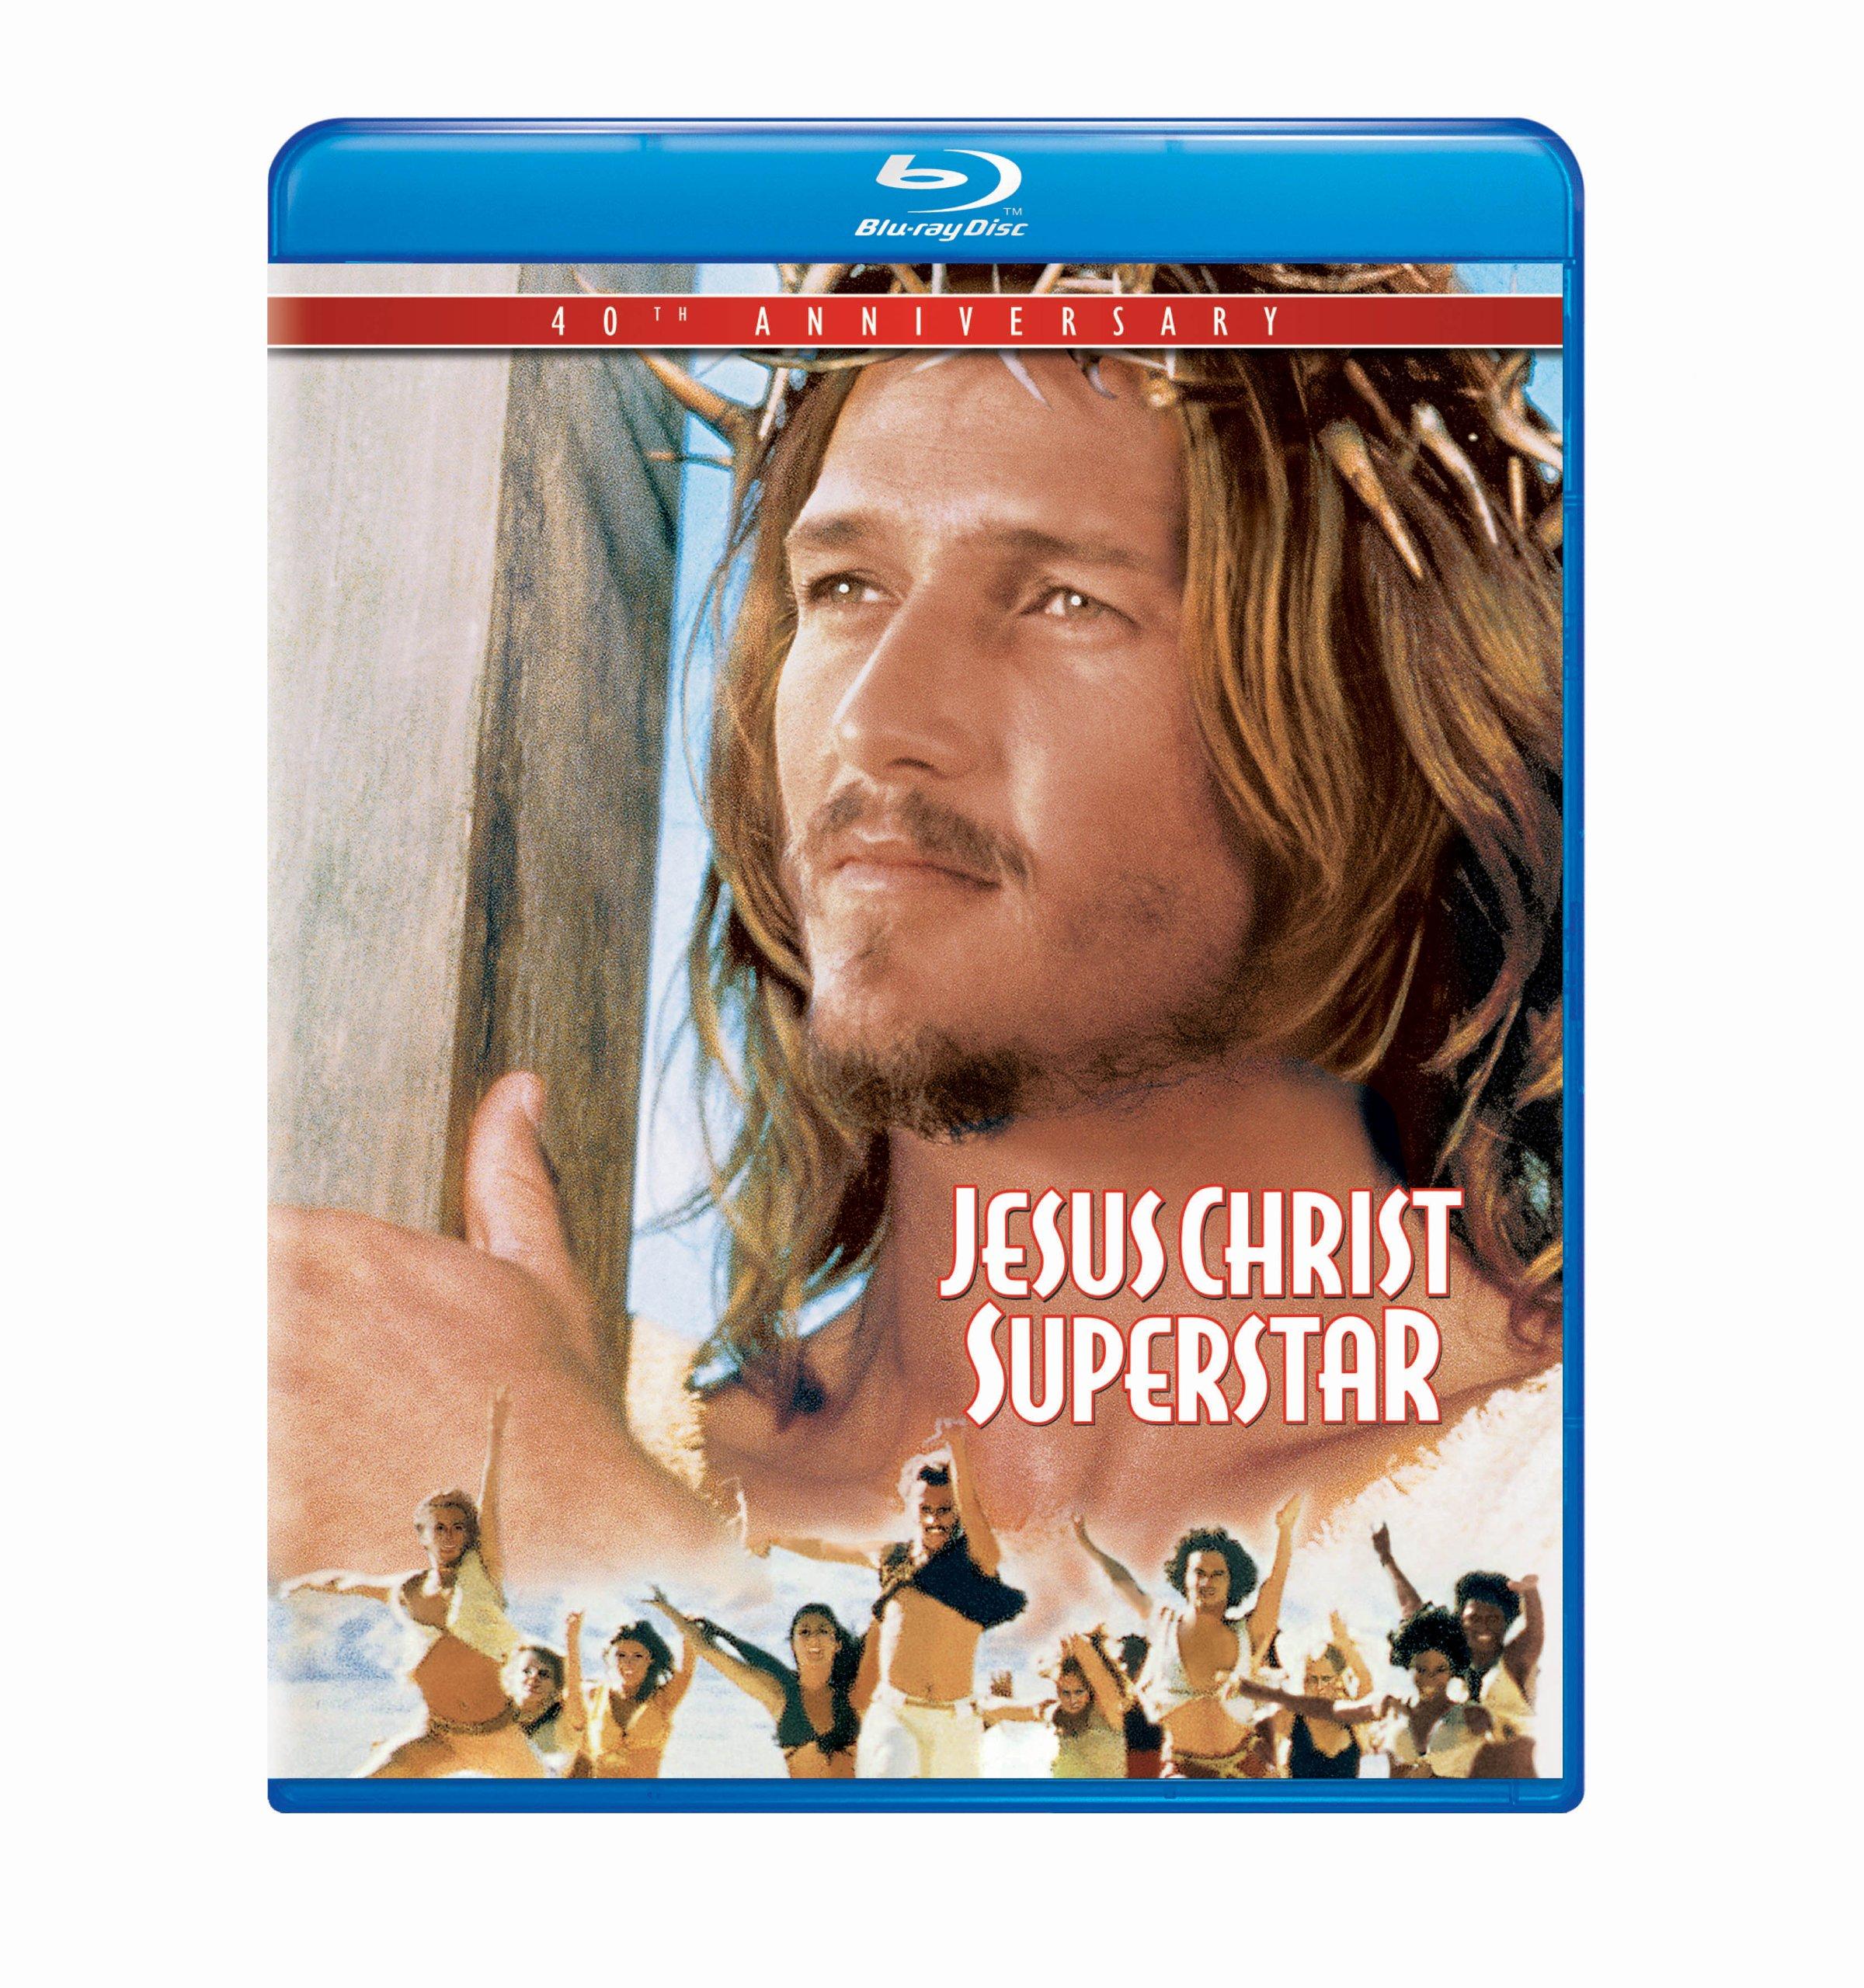 Blu-ray : Jesus Christ Superstar (Anniversary Edition, Snap Case)